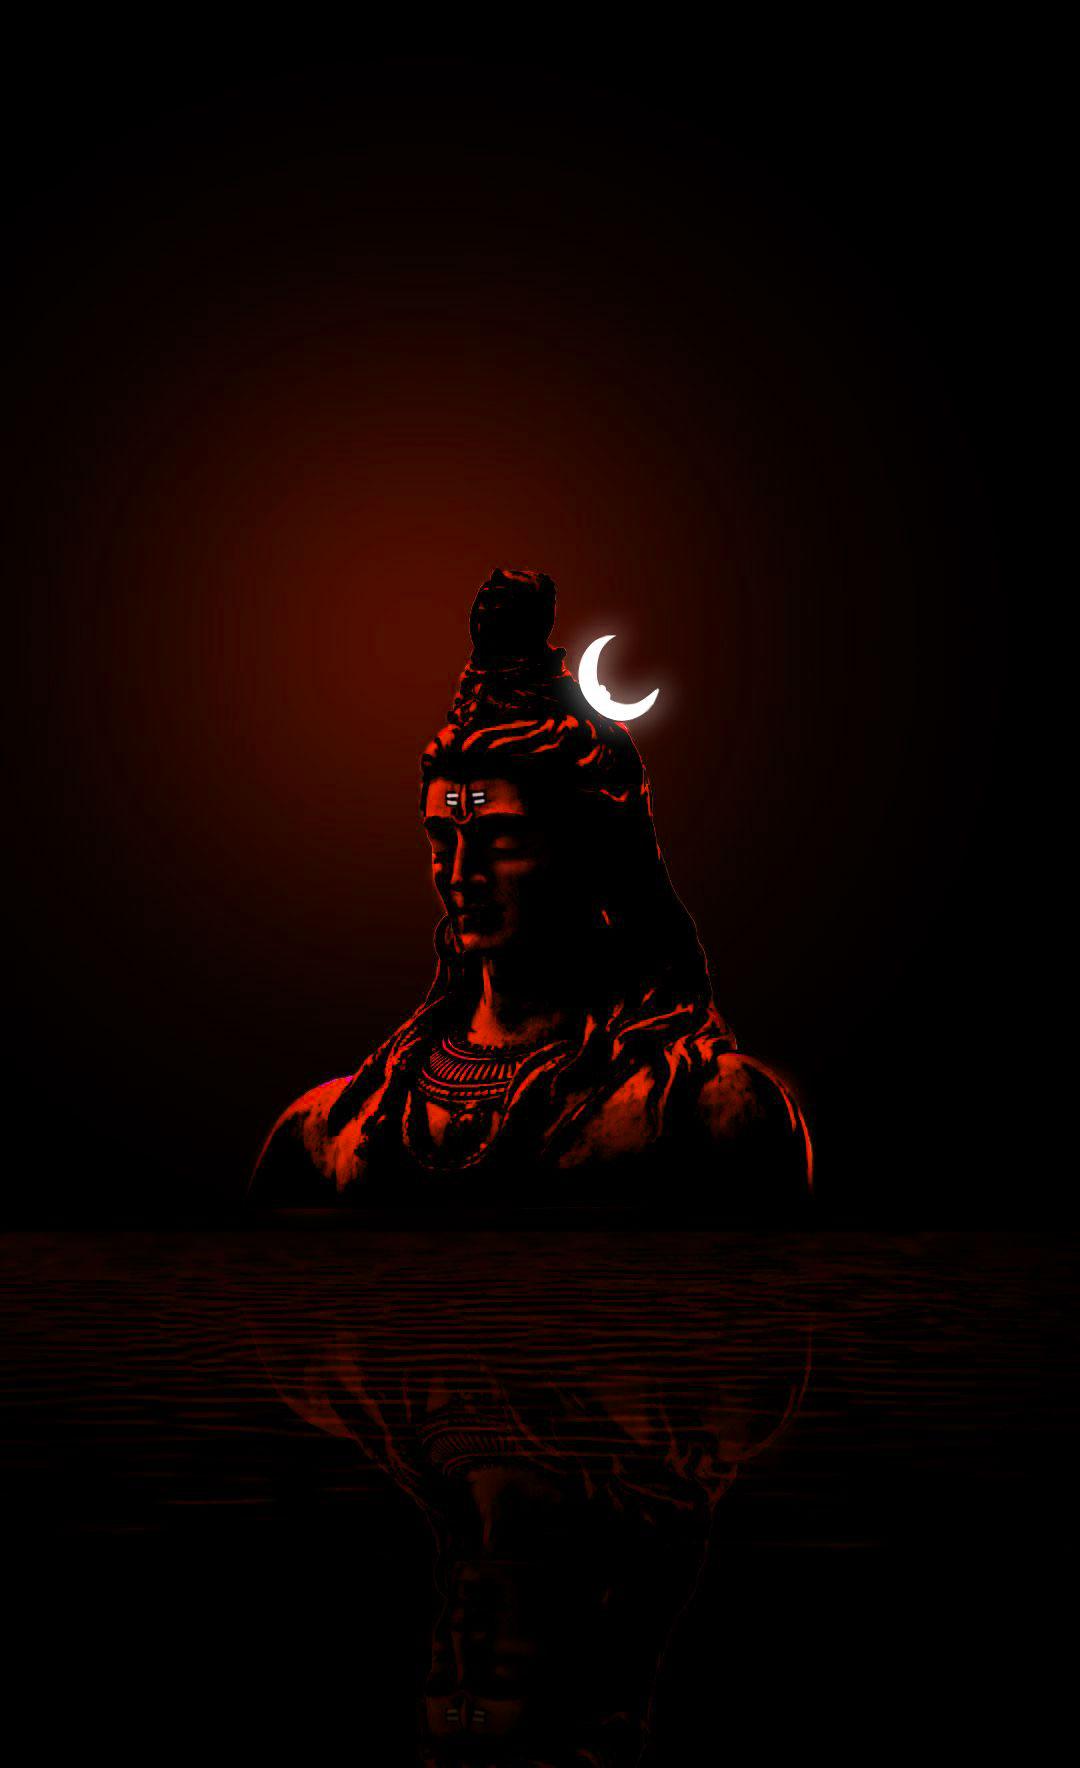 Shiva Images wallpaper photo free hd